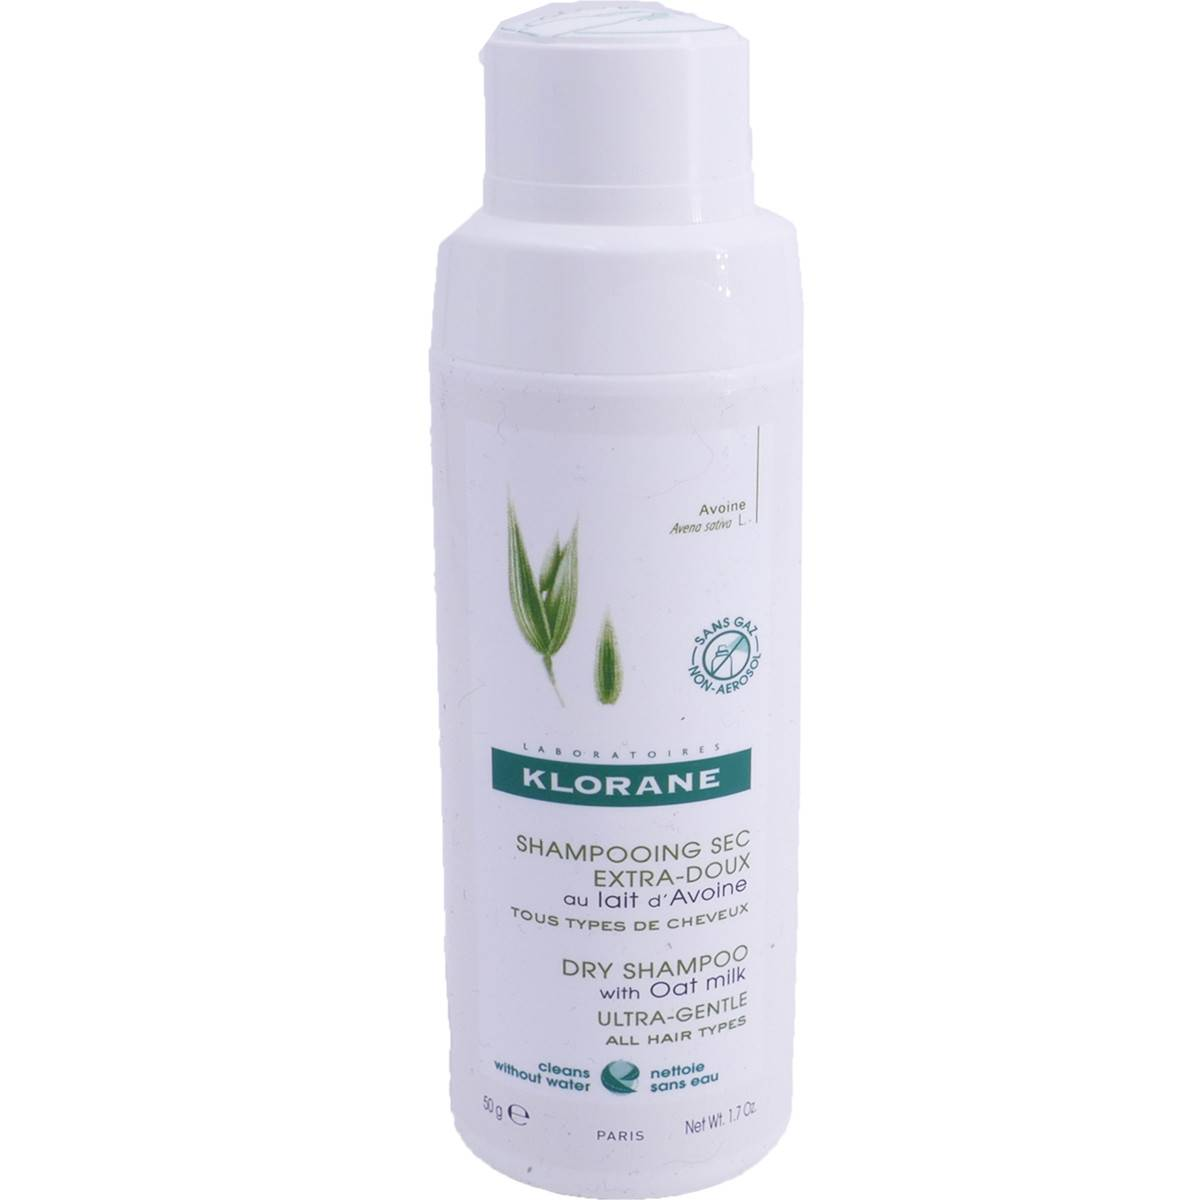 Klorane shampooing sec extra doux 50g